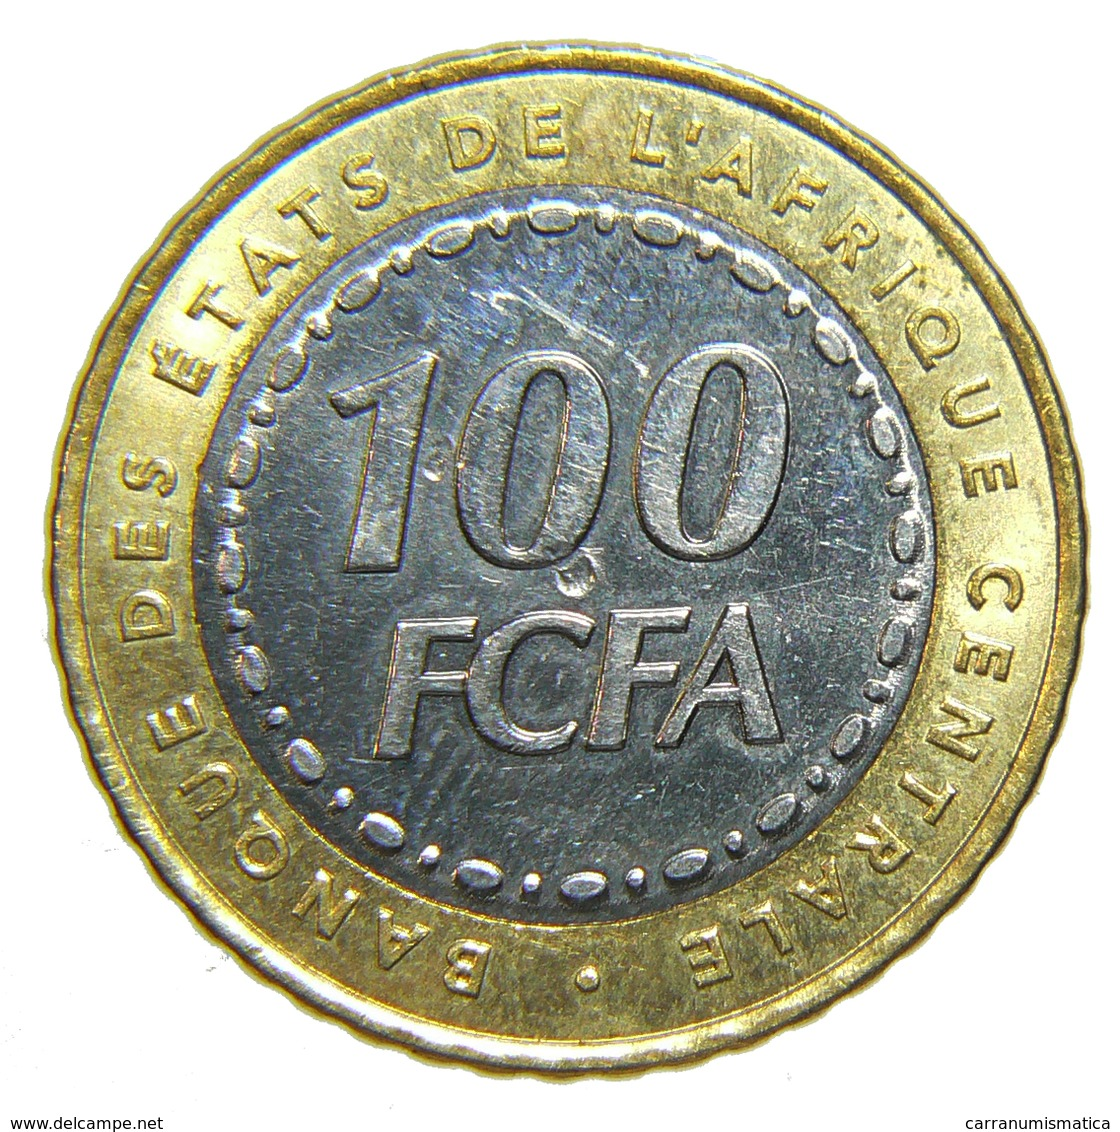 [NC] REPUBBLICA CENTROAFRICANA - 100 FRANCHI 2006 - BIMETALLICA - Repubblica Centroafricana